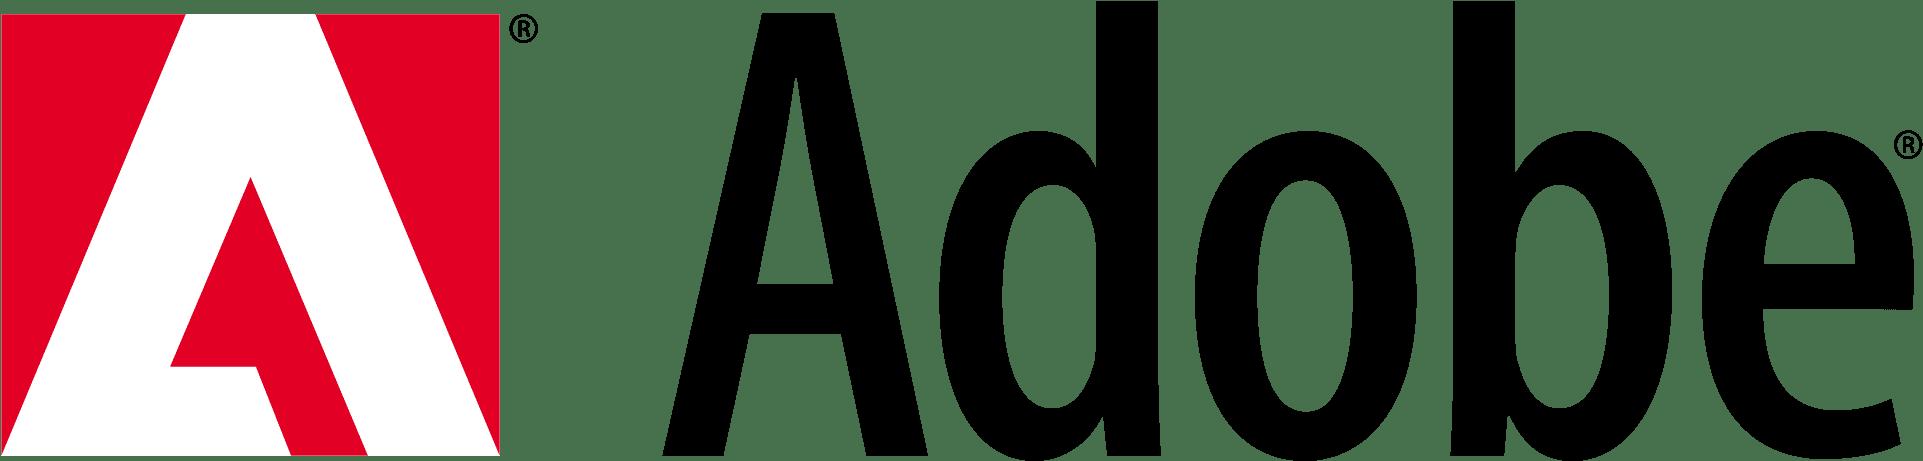 toppng.com-adobe-logo-png-transparent-background-adobe-logo-1923x461-1